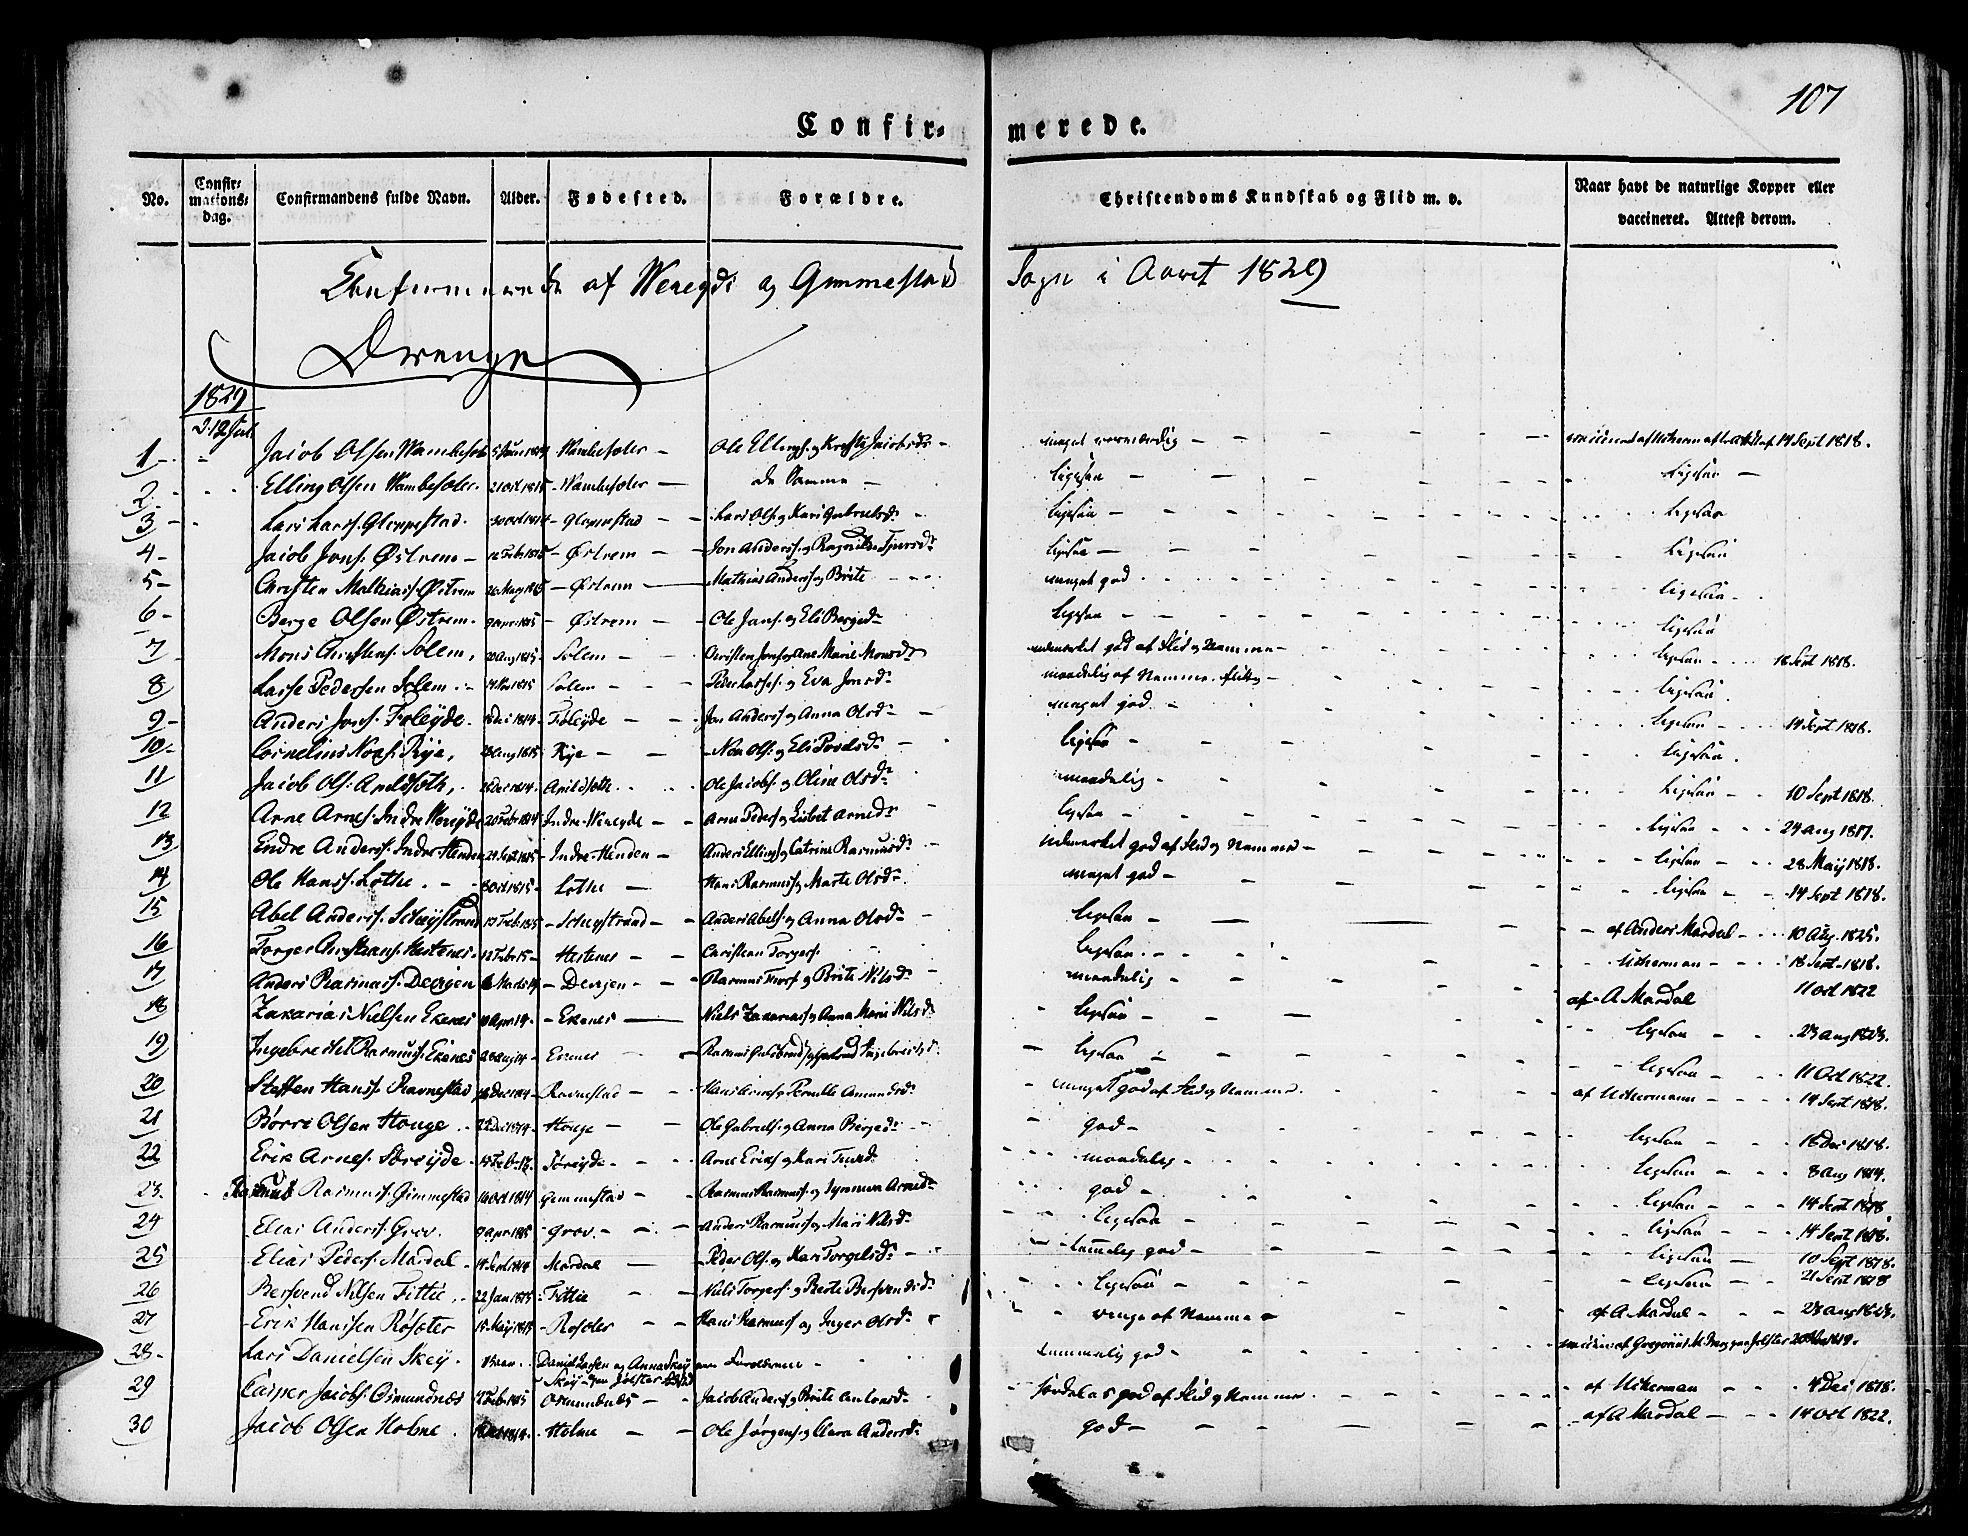 SAB, Gloppen Sokneprestembete, H/Haa/Haaa/L0007: Ministerialbok nr. A 7, 1827-1837, s. 107